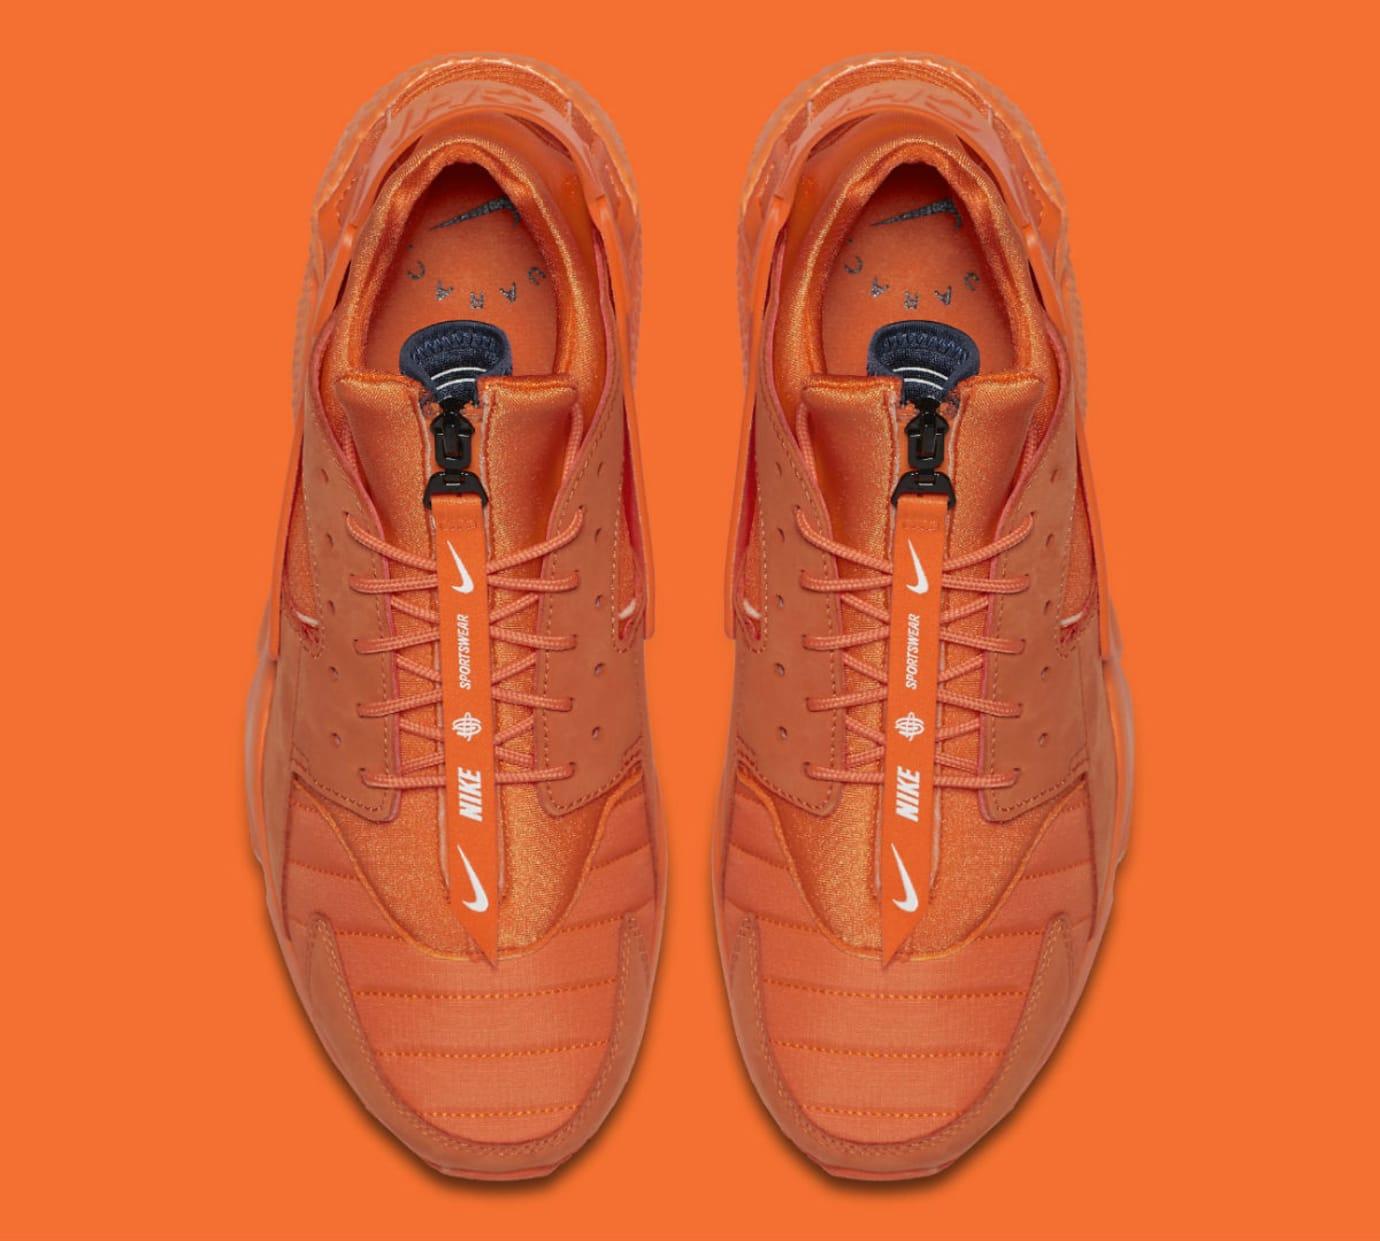 Nike Air Huarache Run Chicago Orange Release Date AJ5578-800 Top